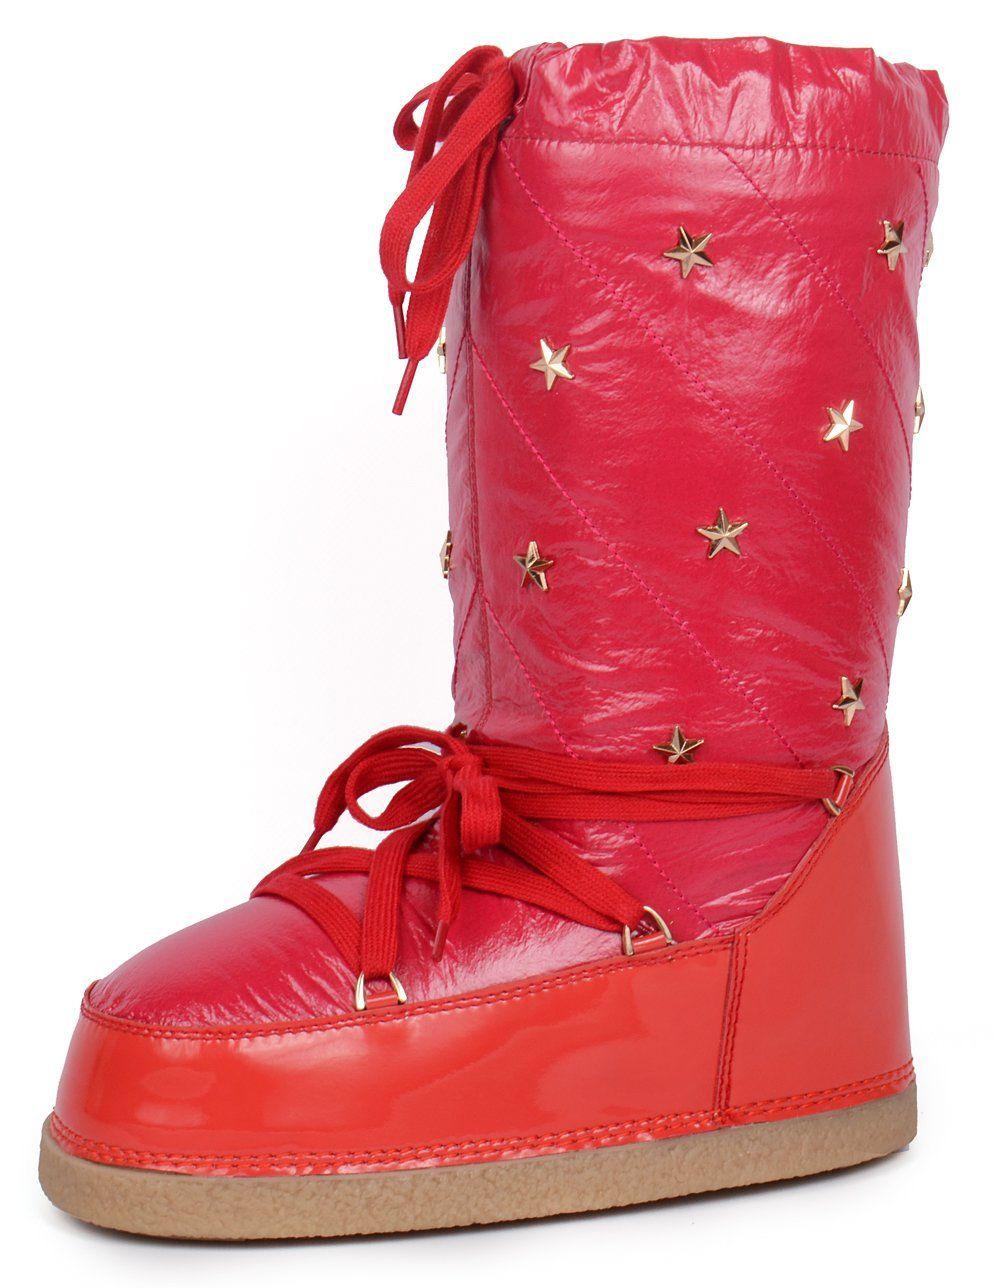 3ad992f118246 ᐉ Купить Дутики женские луноходы термо Moon Boots Red самая теплая ...